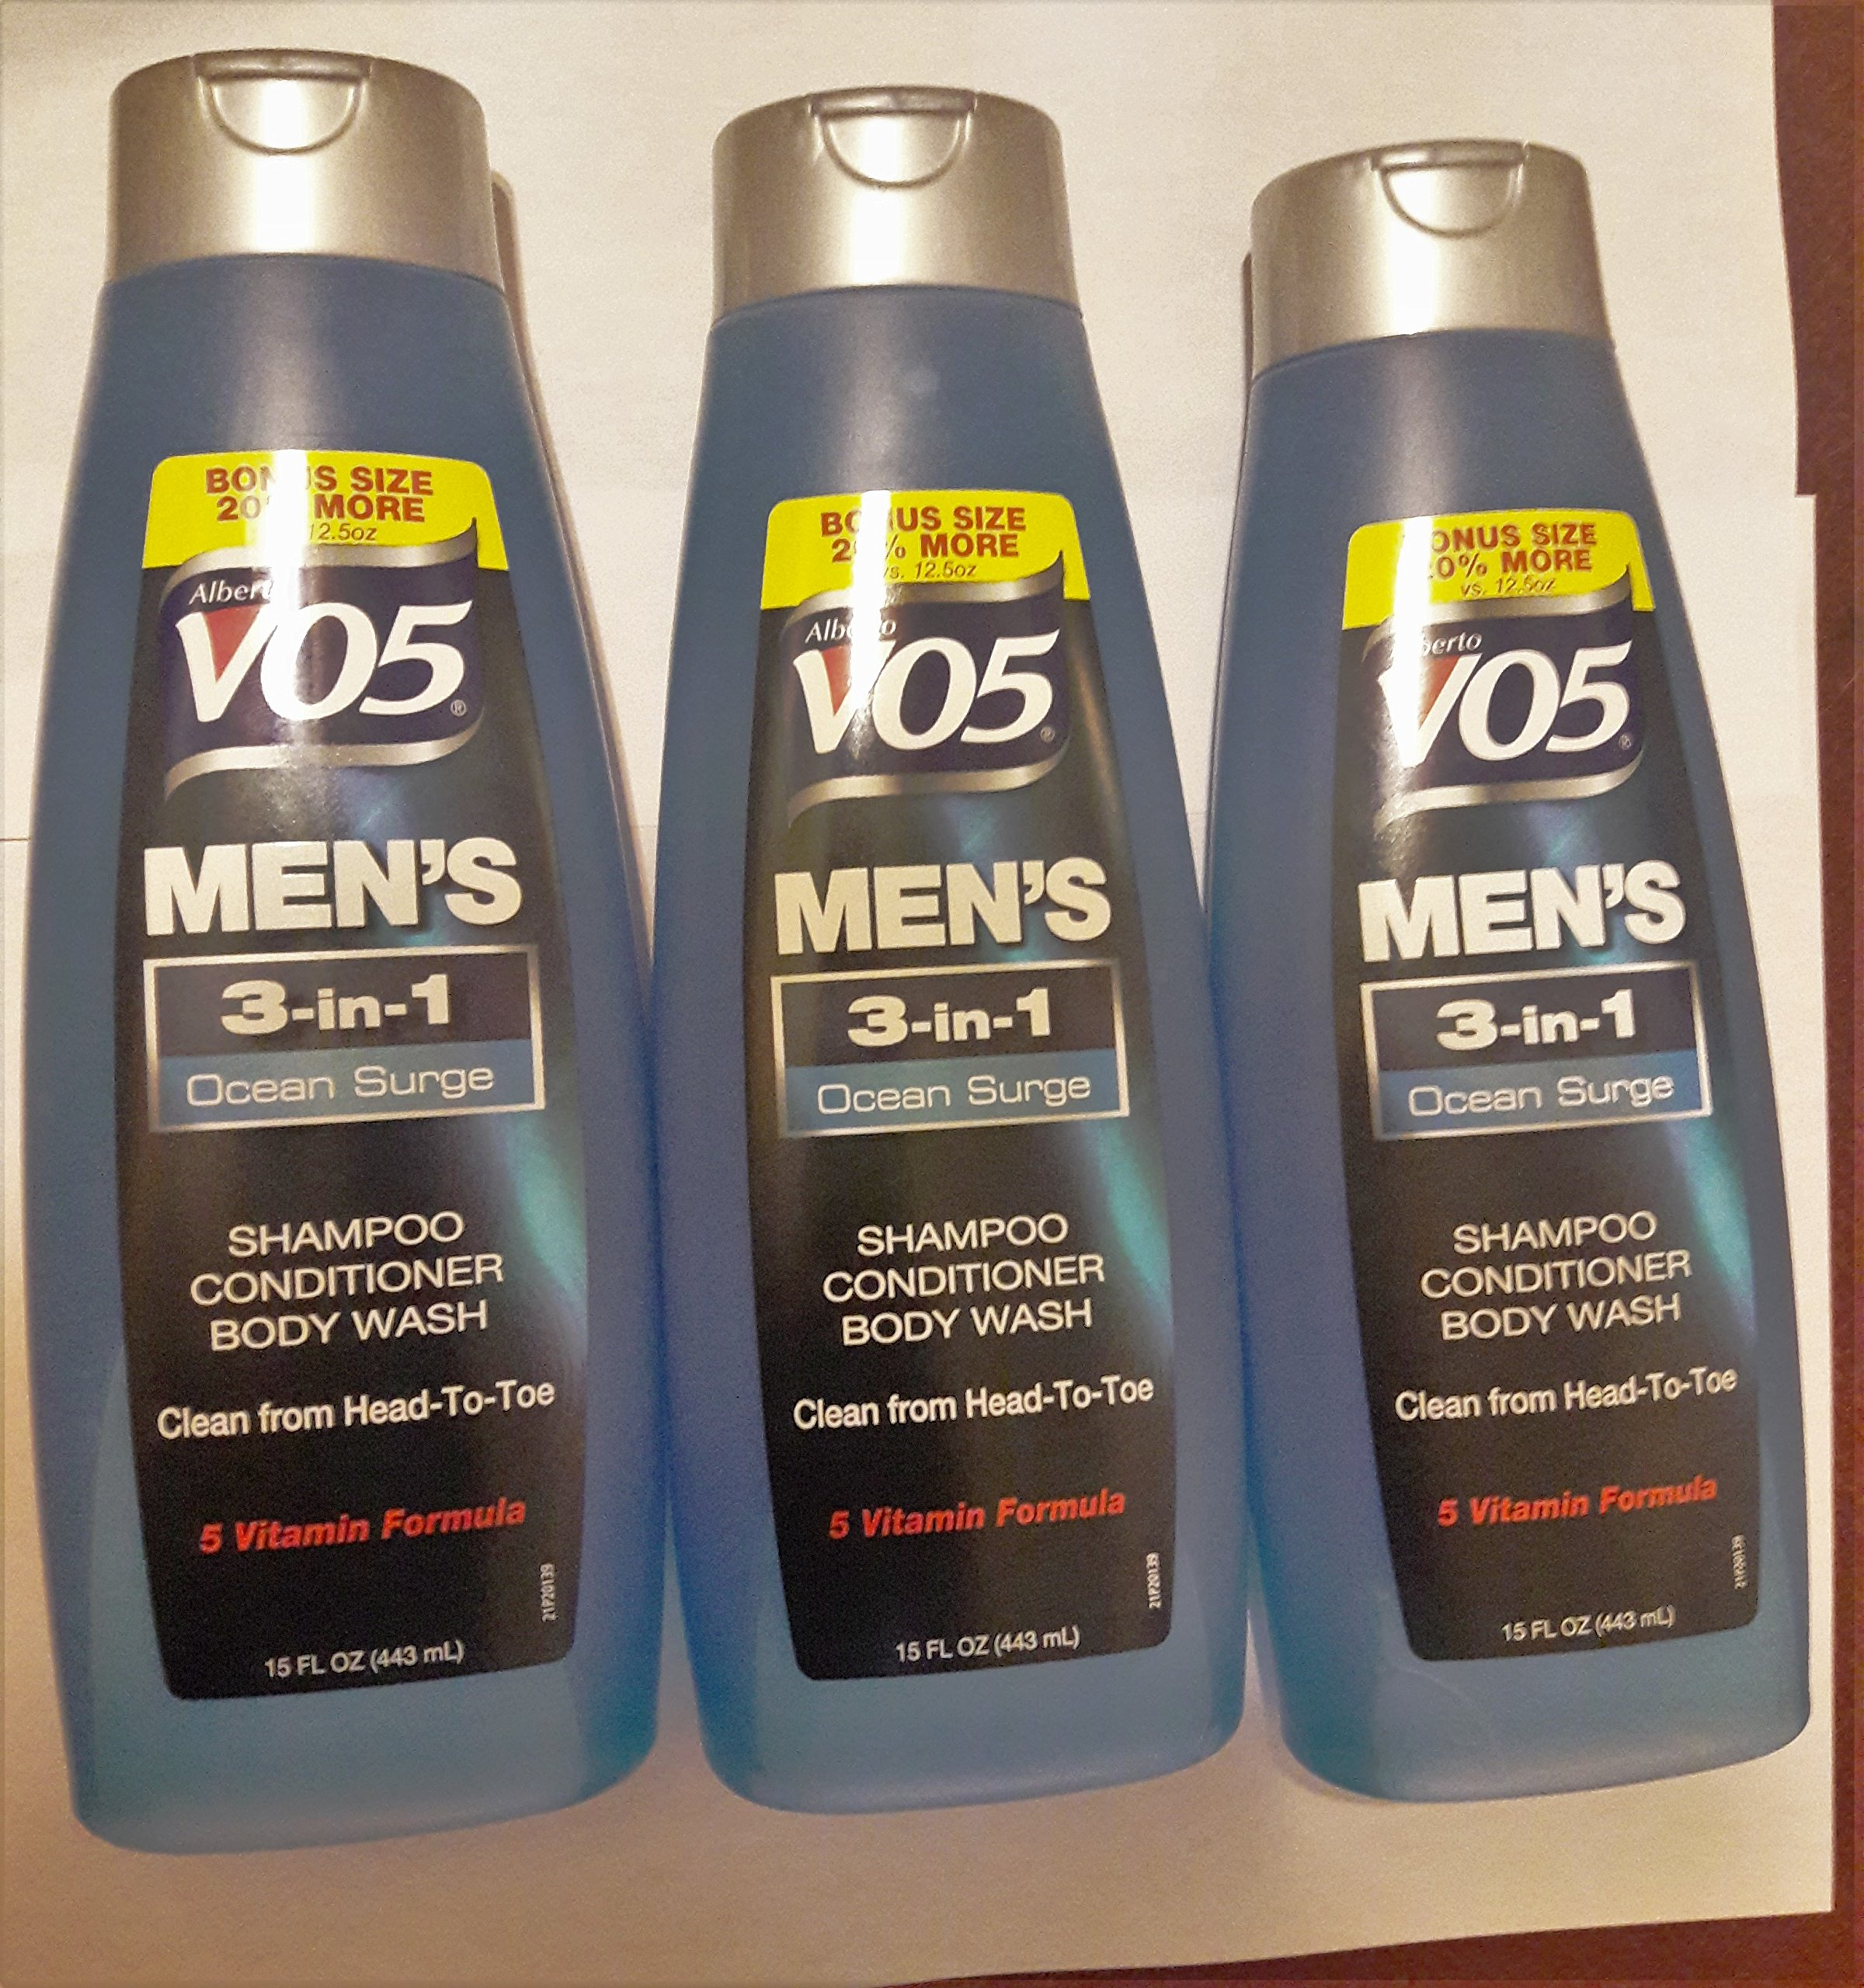 3 Pk, Alberto VO5 Men's 3-in-1 Shampoo Conditioner Body Wash , Ocean Surge 15 fl. oz. by Unknown